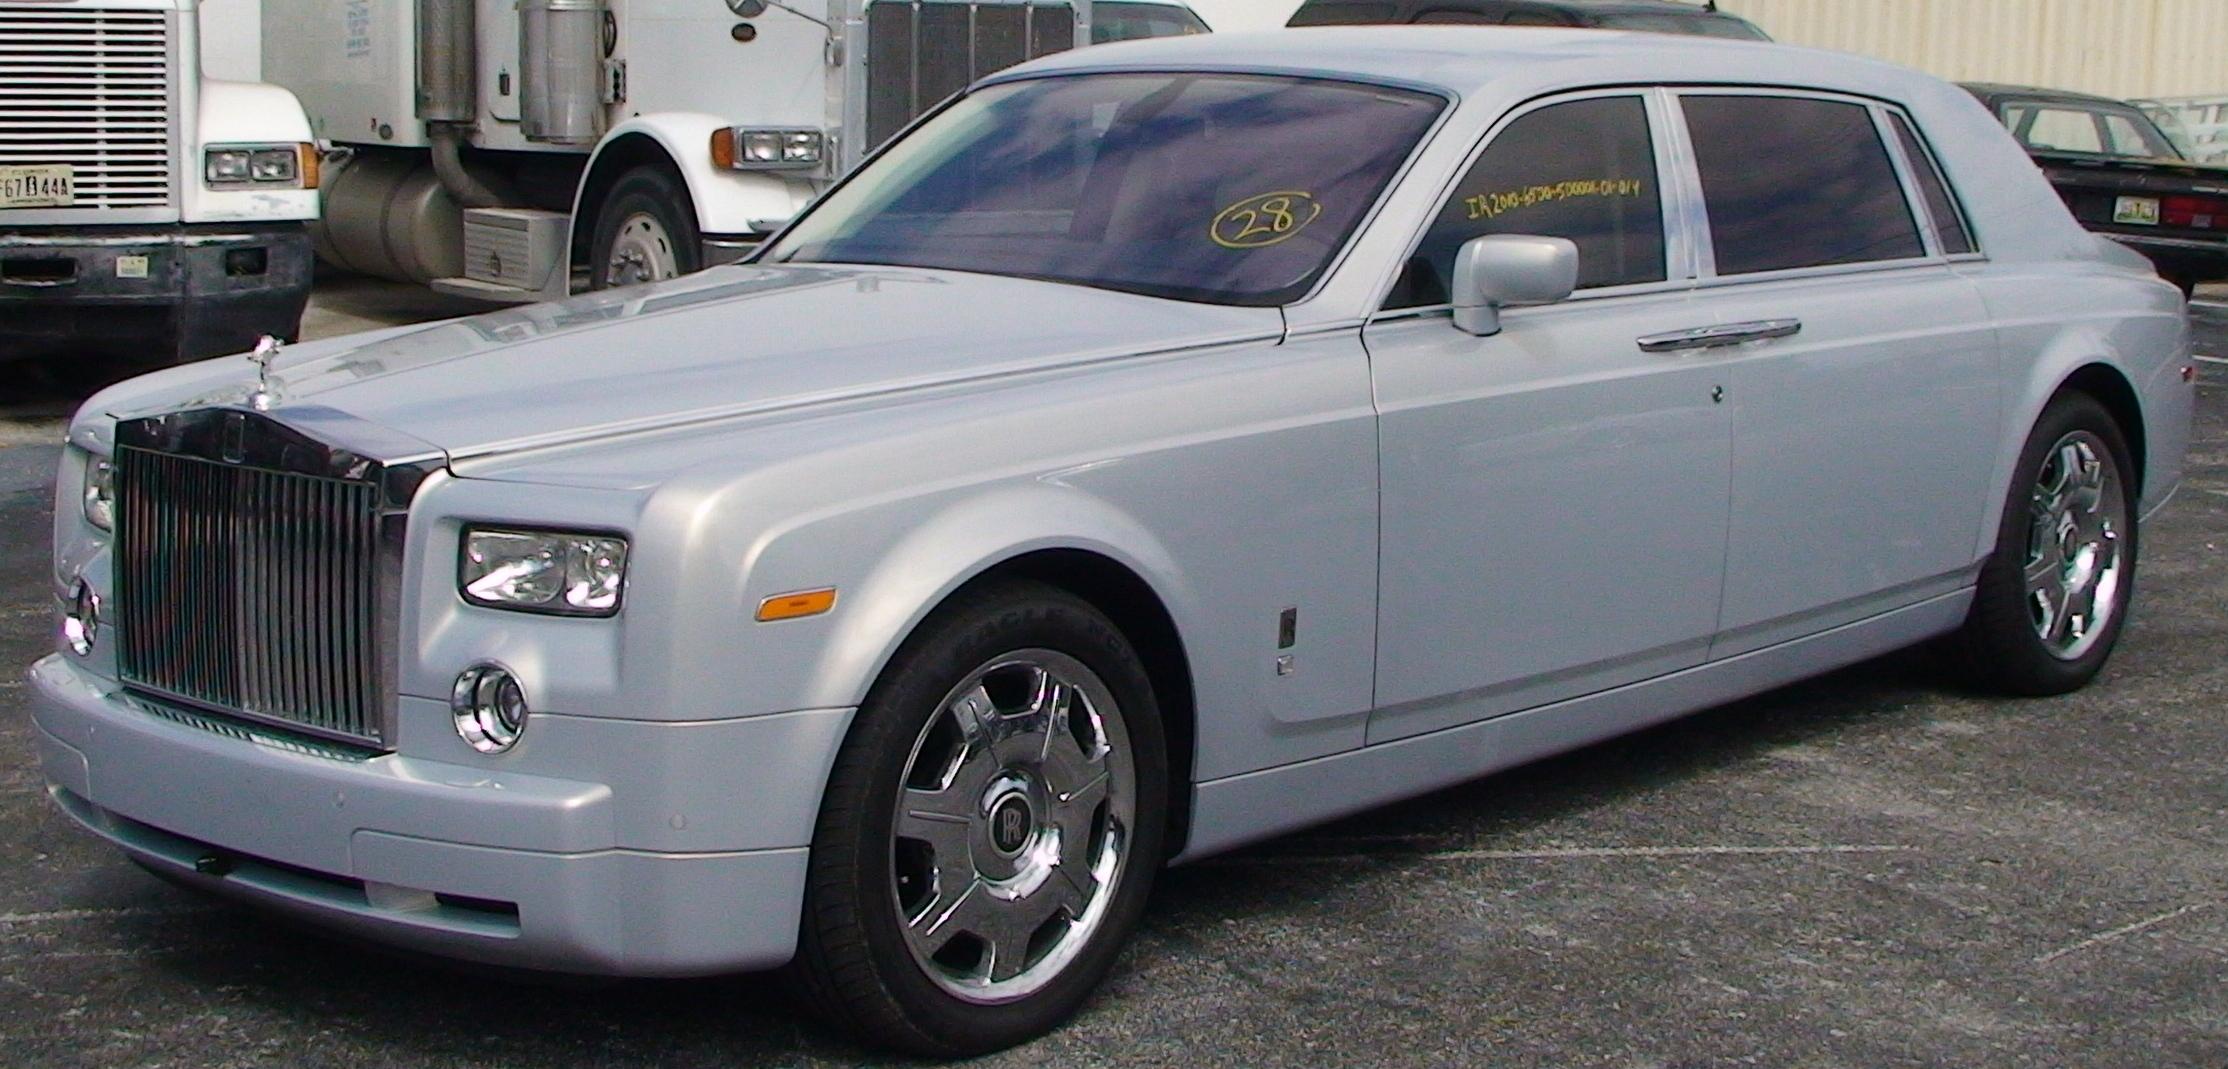 2007 rolls royce phantom partsopen. Black Bedroom Furniture Sets. Home Design Ideas